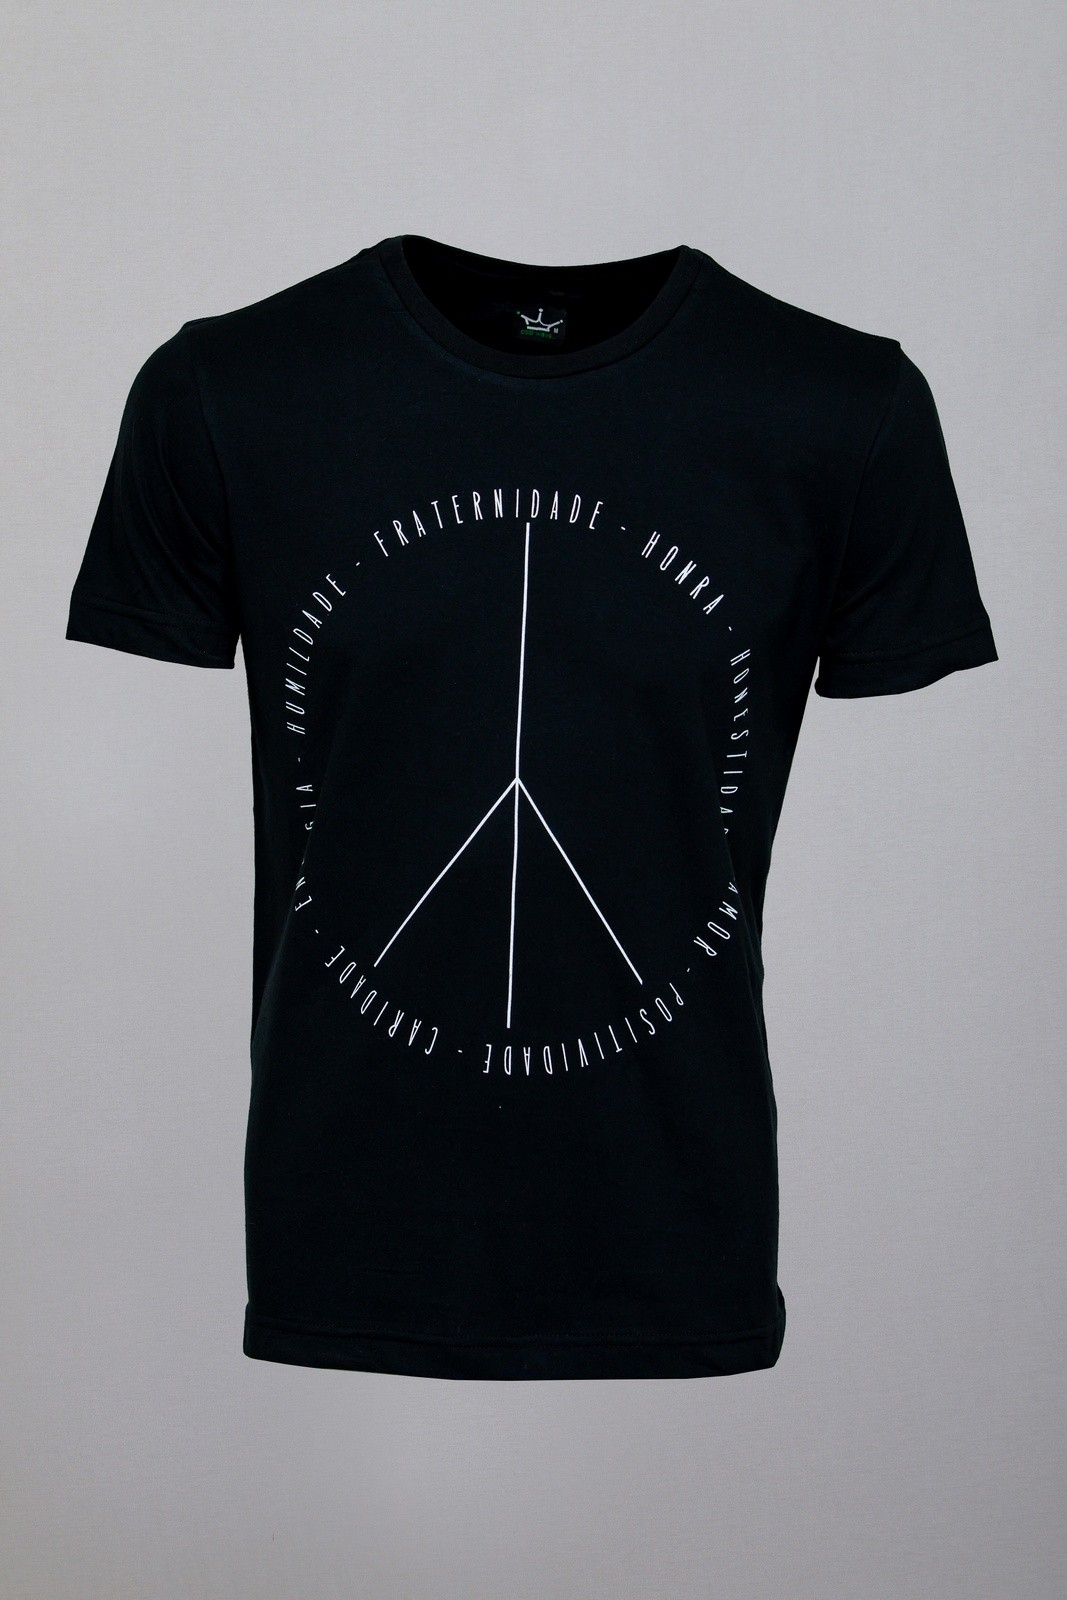 Camiseta CoolWave Principles Preta